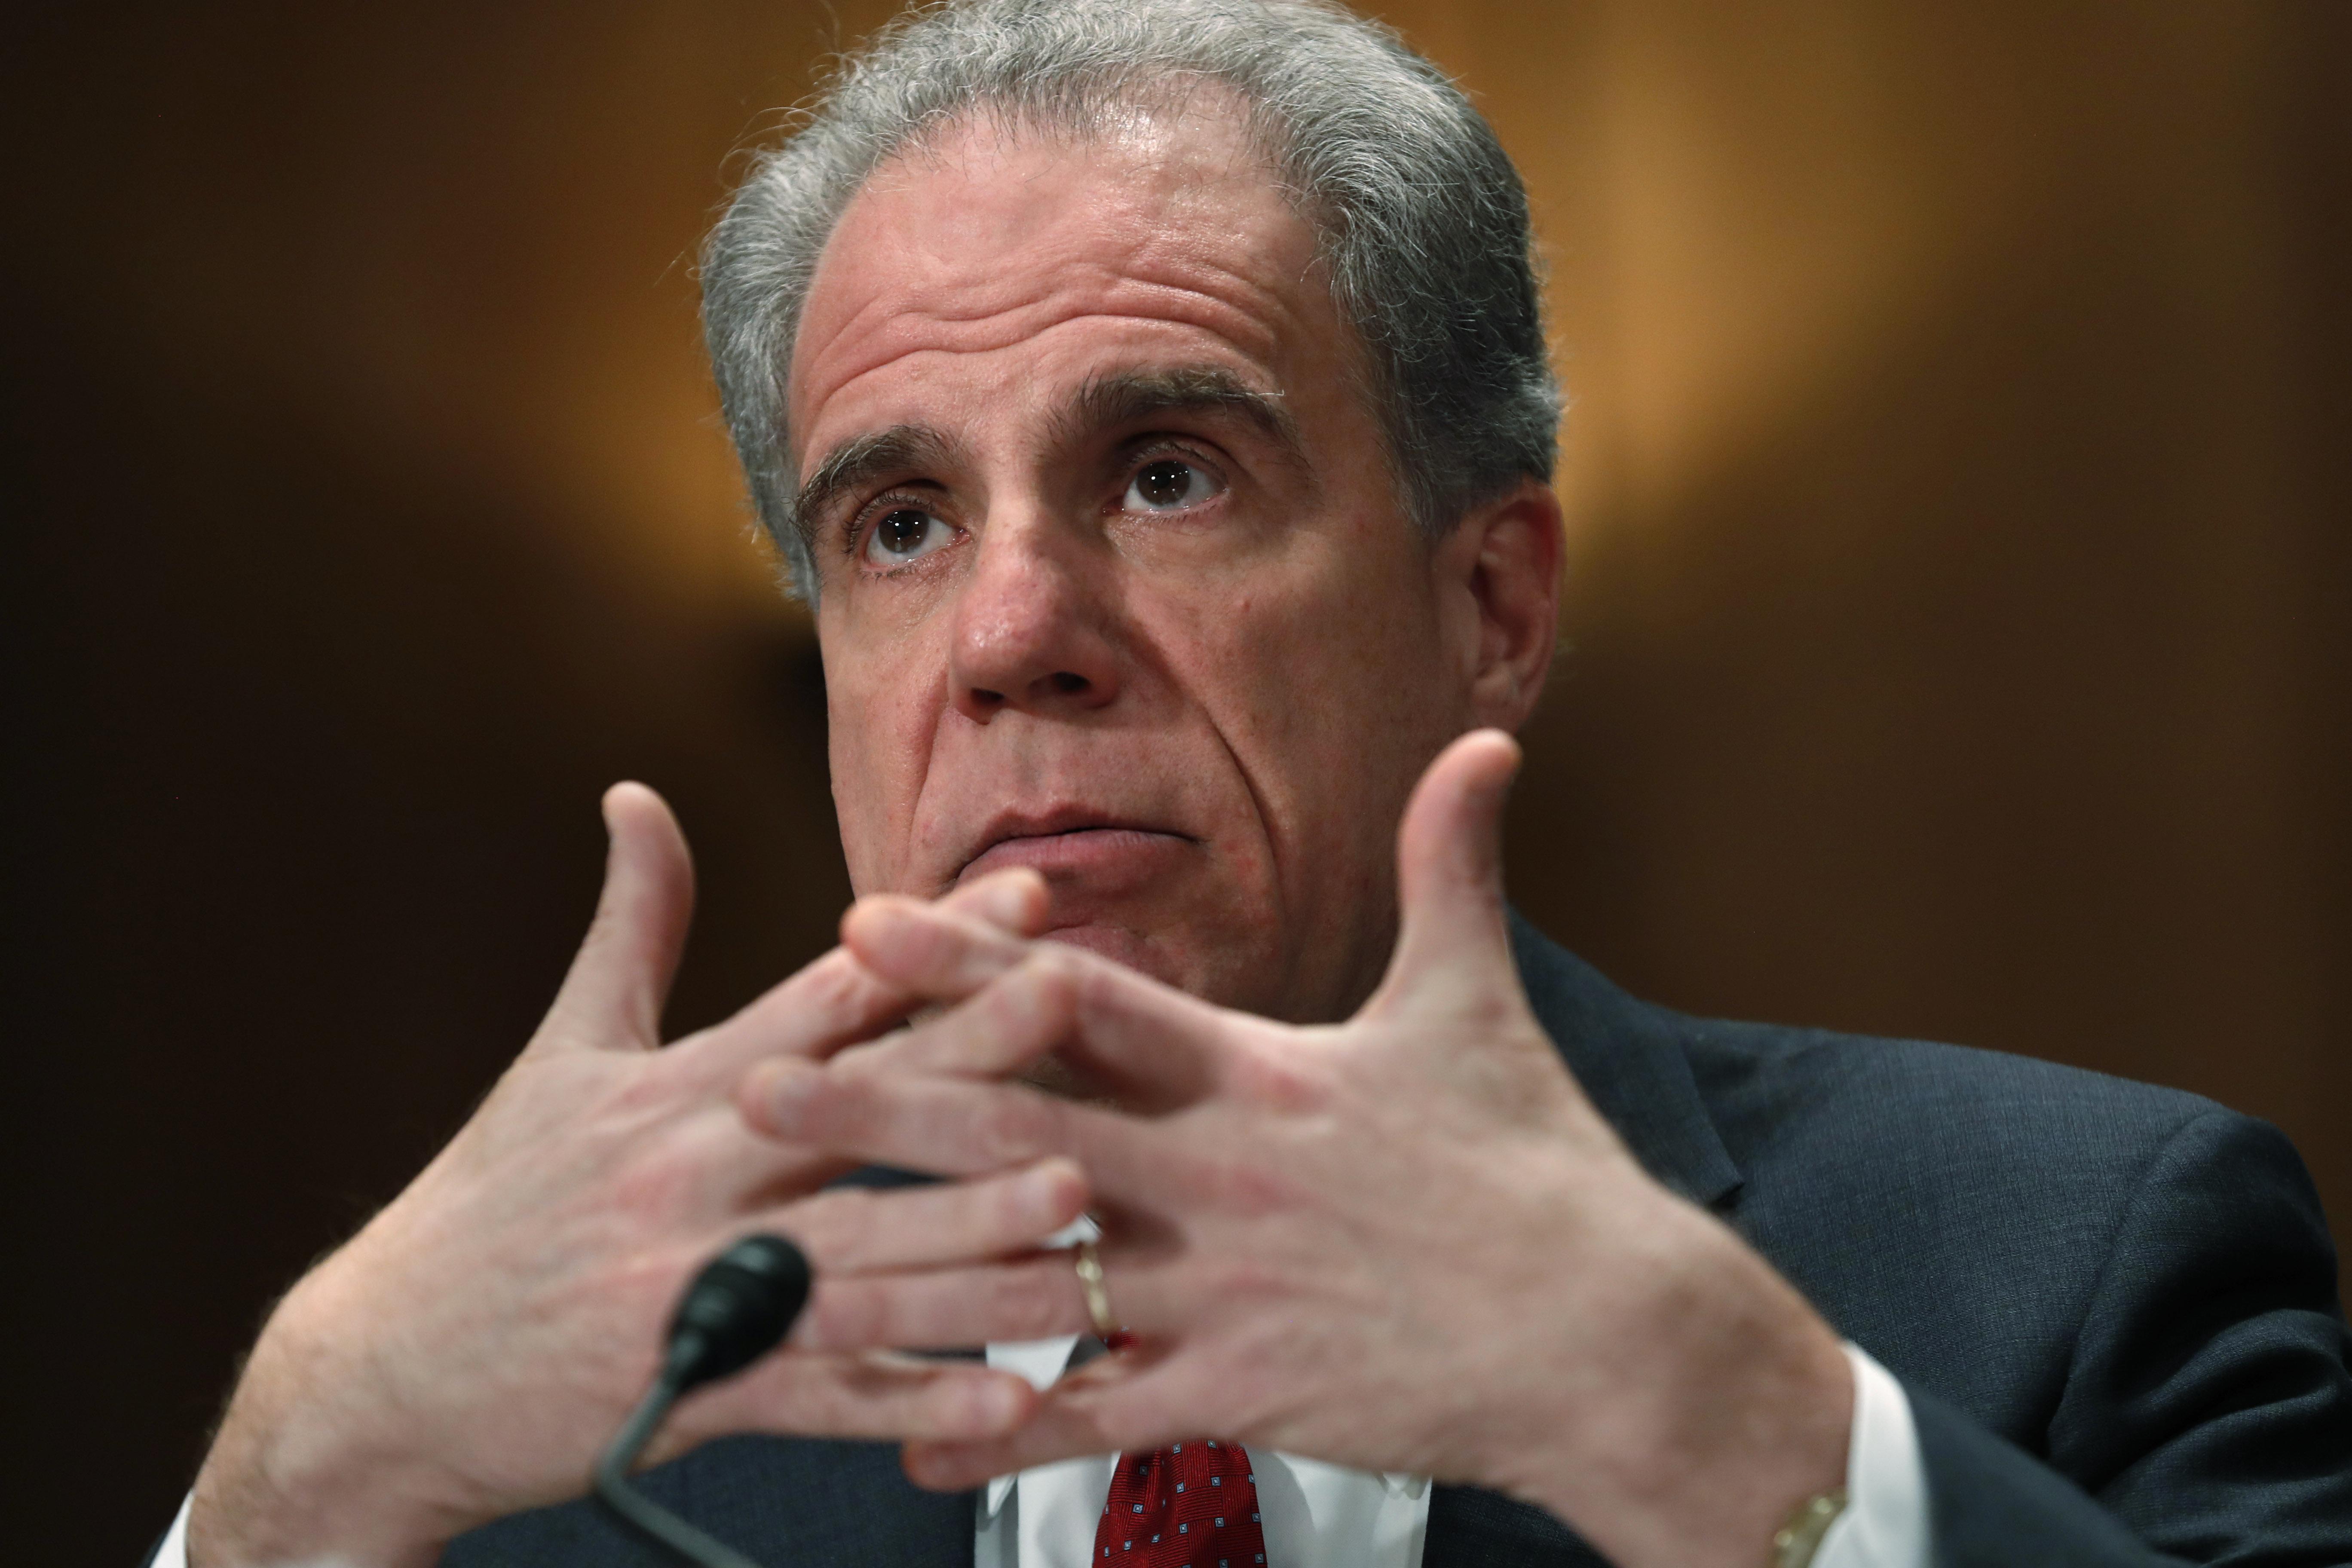 FBI Crossfire Hurricane probe source for Trump conspiracy was dossier